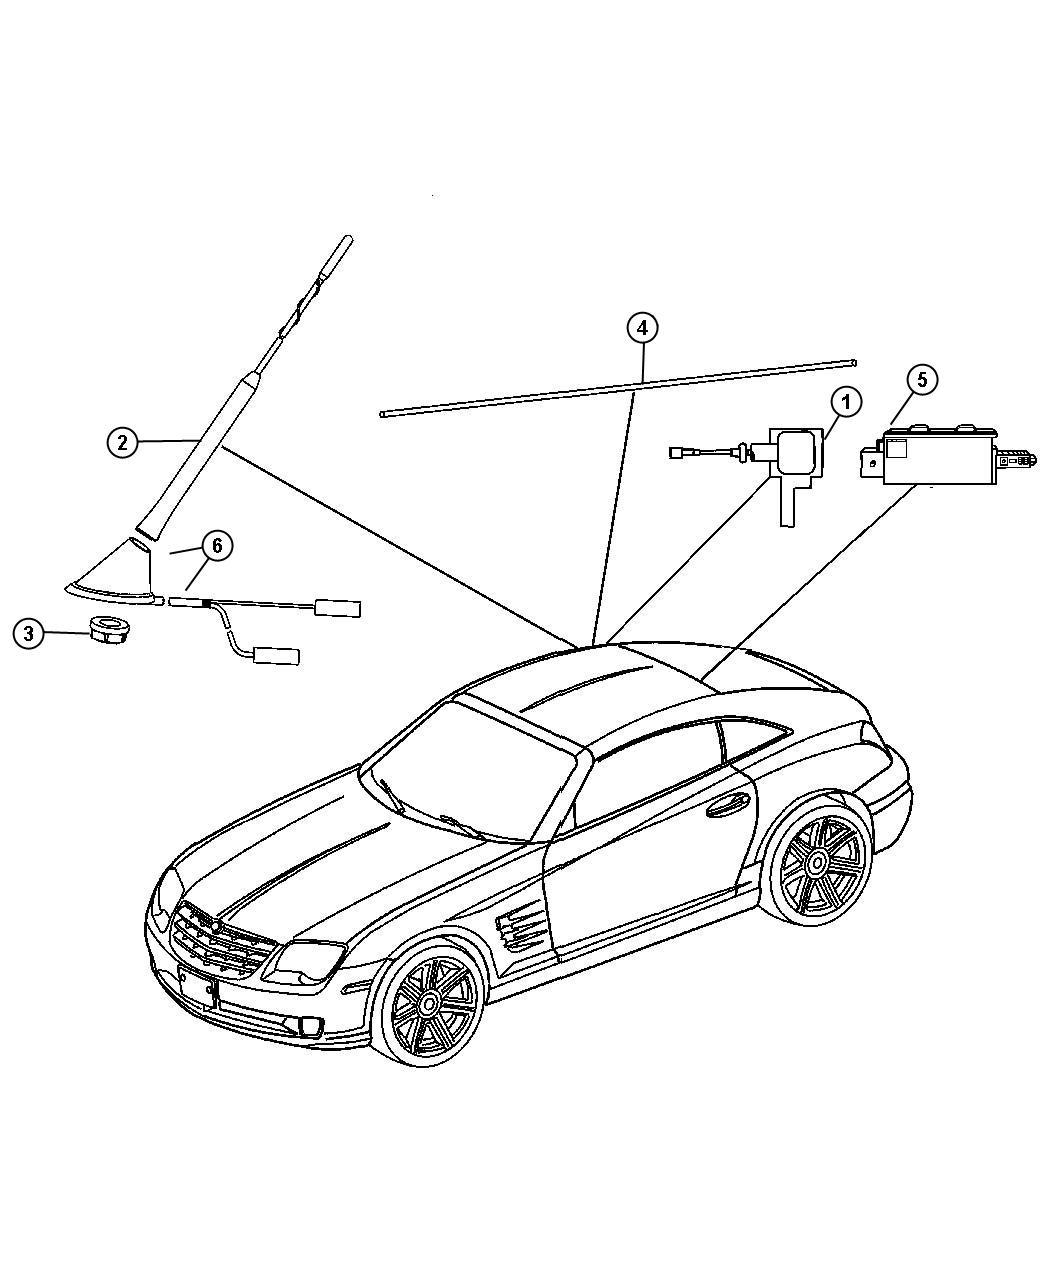 service manual  2005 chrysler crossfire antenna repair